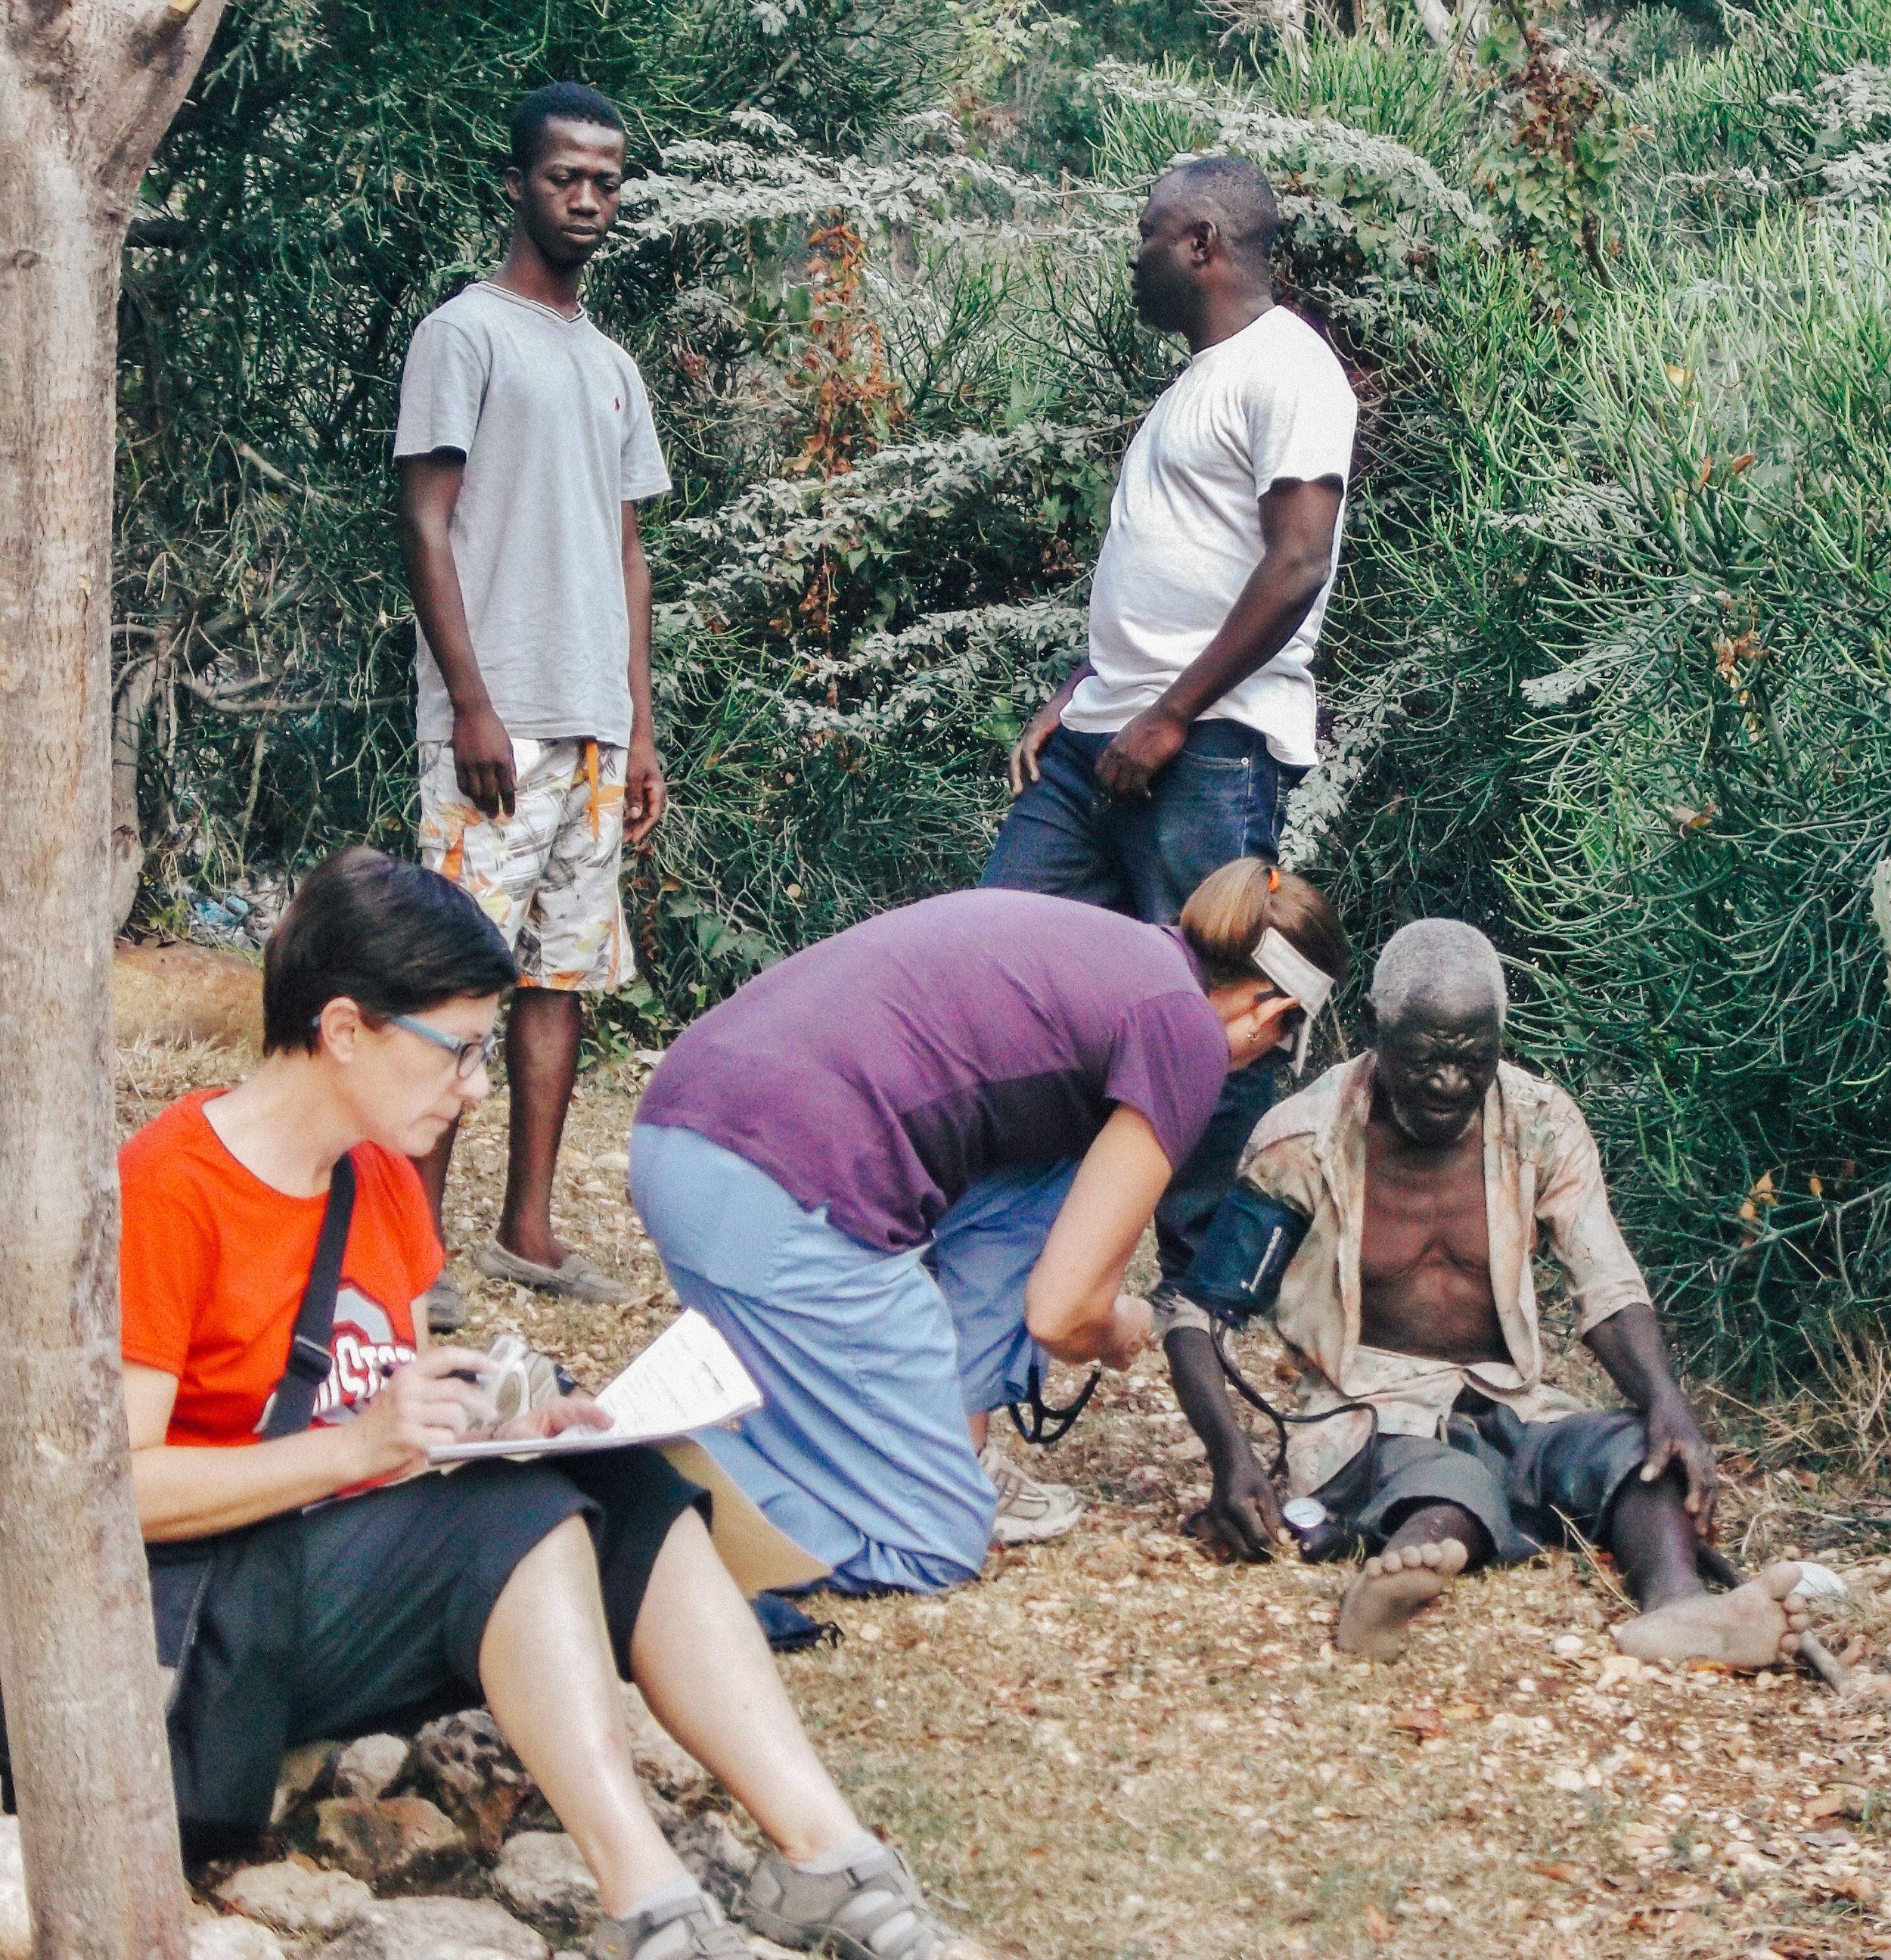 Haiti_Medical_missions_healthcare_healing_art_missions_02.JPG